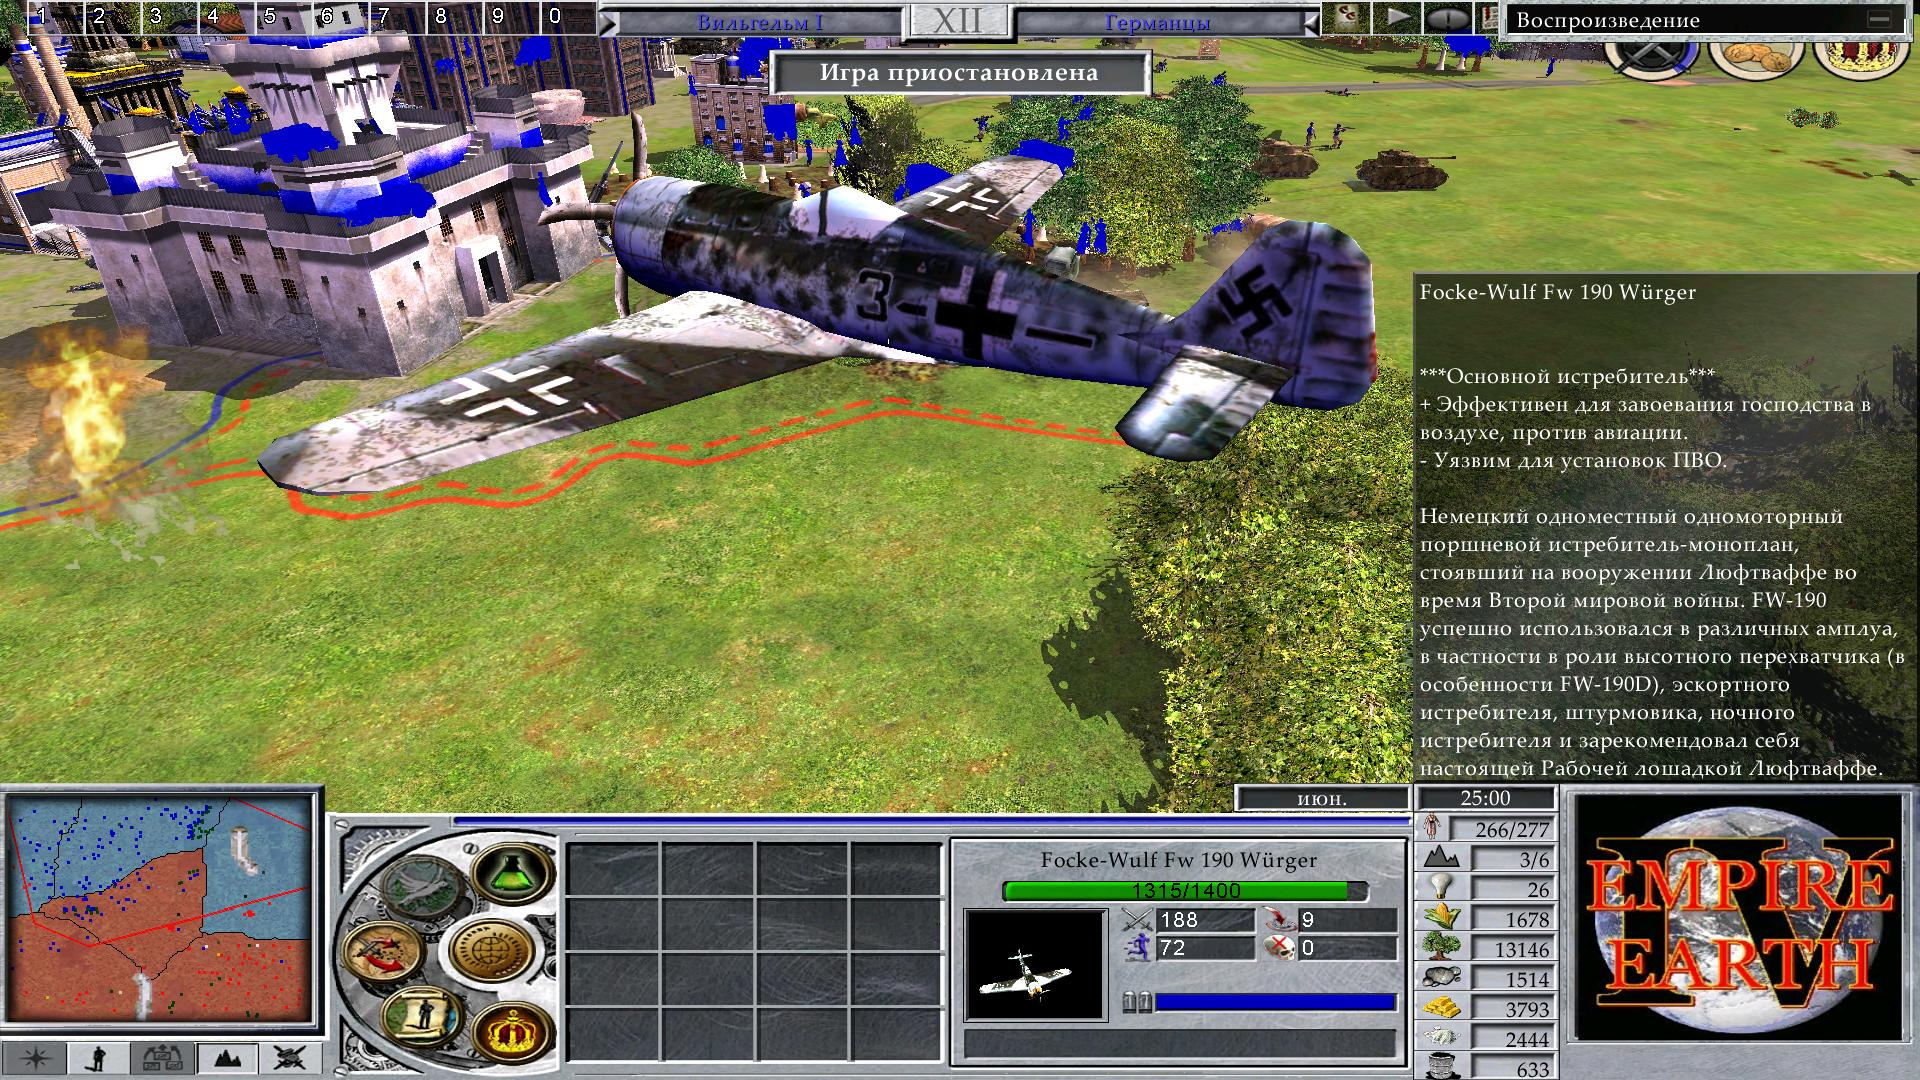 Empire Earth Iv V9 6 0 File Mod Db